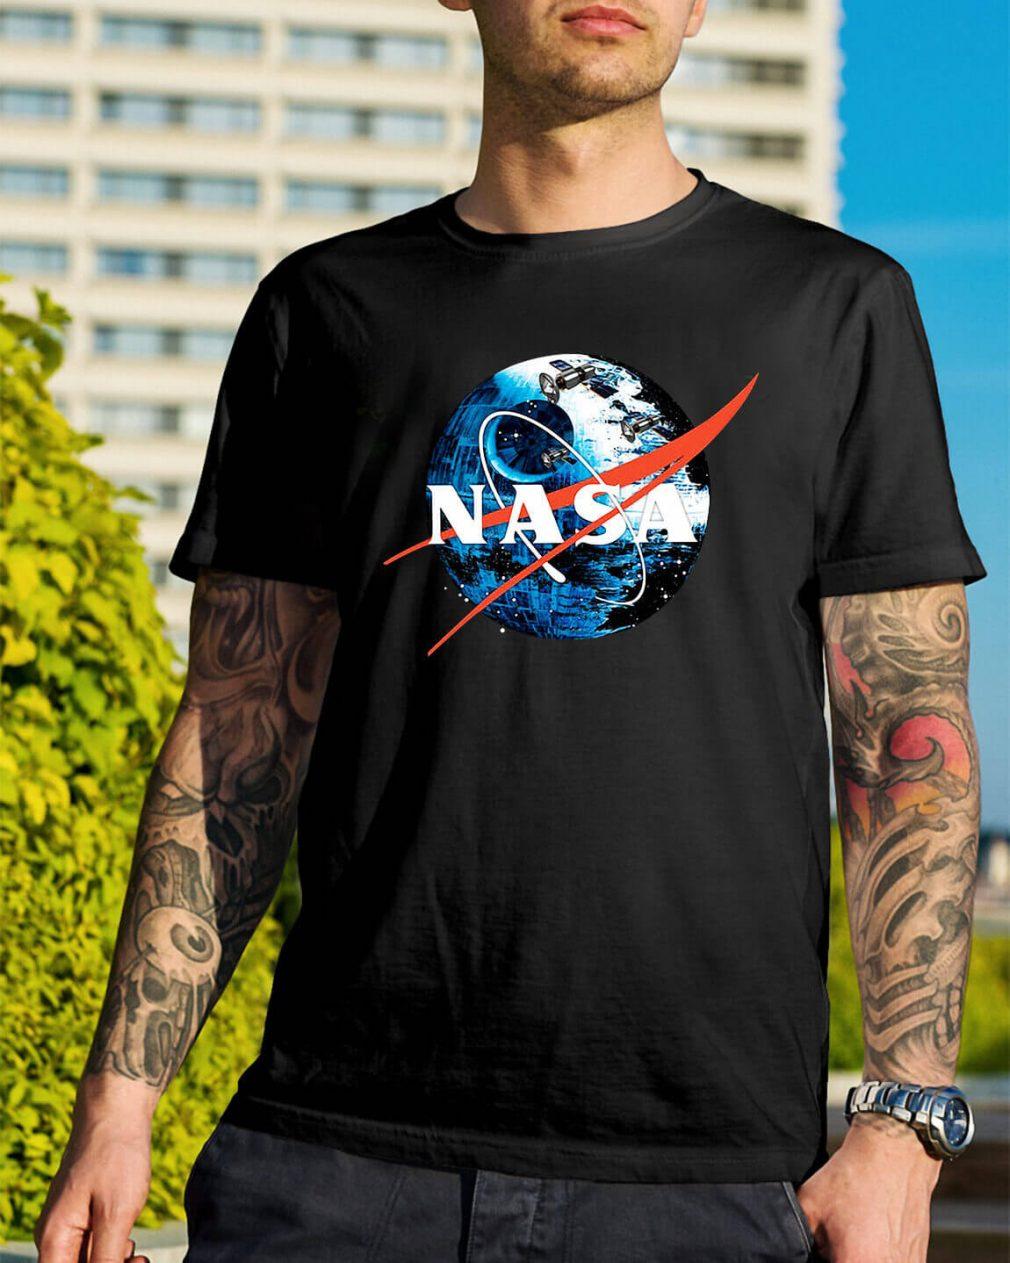 The Second NASA Death Star Wars shirt